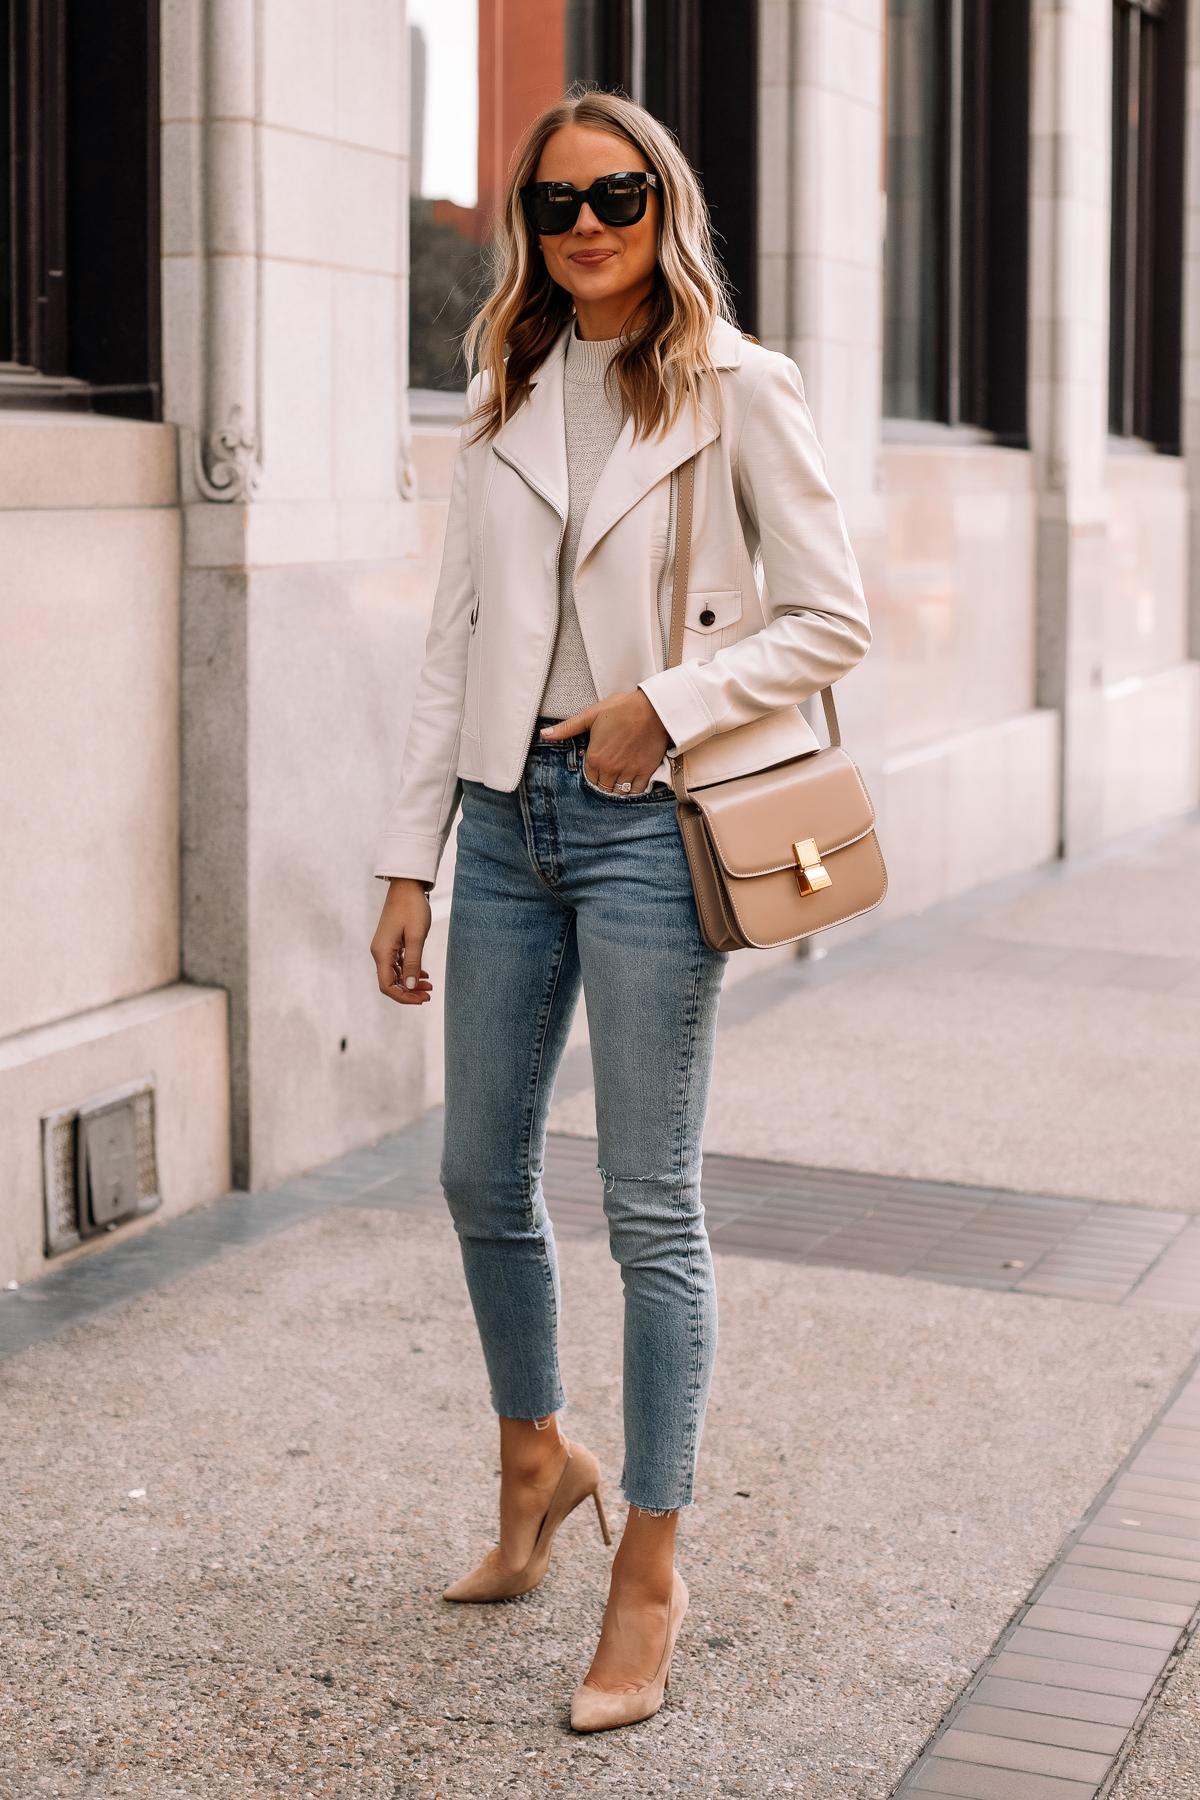 Fashion Jackson Wearing Beige Moto Jacket Denim Skinny Jeans Nude Pumps Beige Celine Box Bag